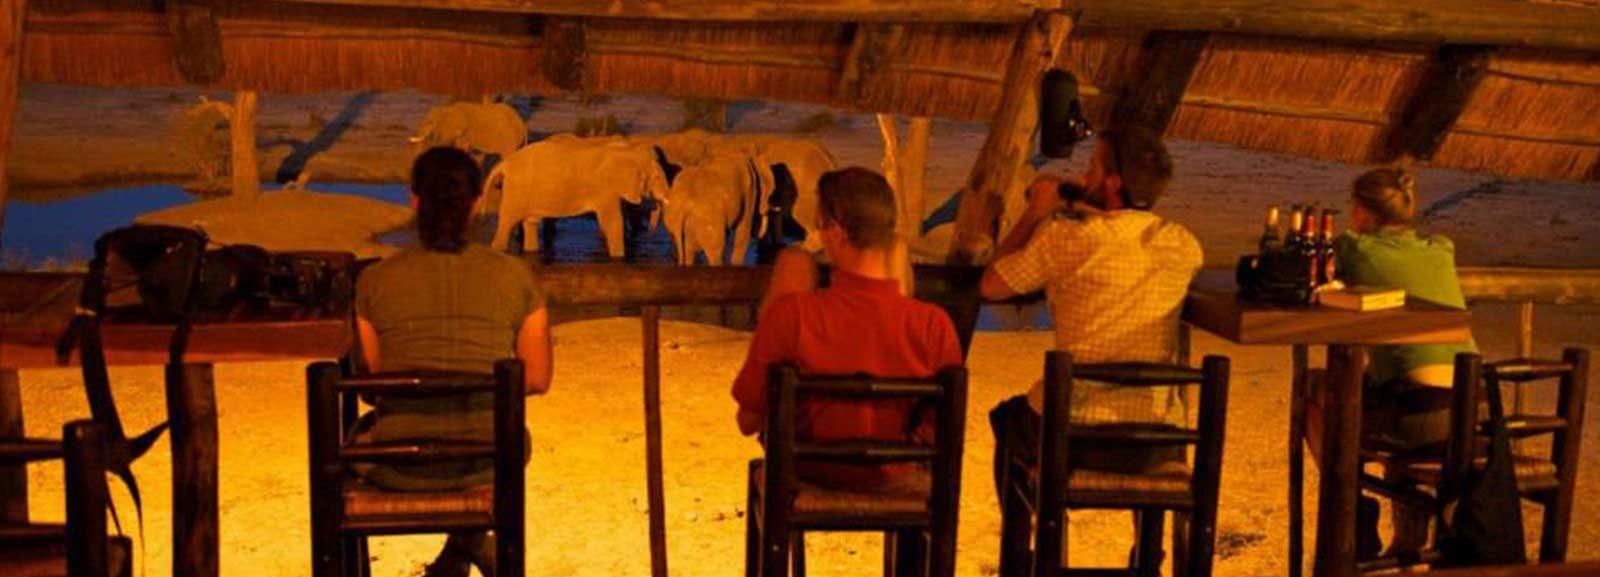 SENYATI SAFARI CAMP   Self-catering accommodation and camping